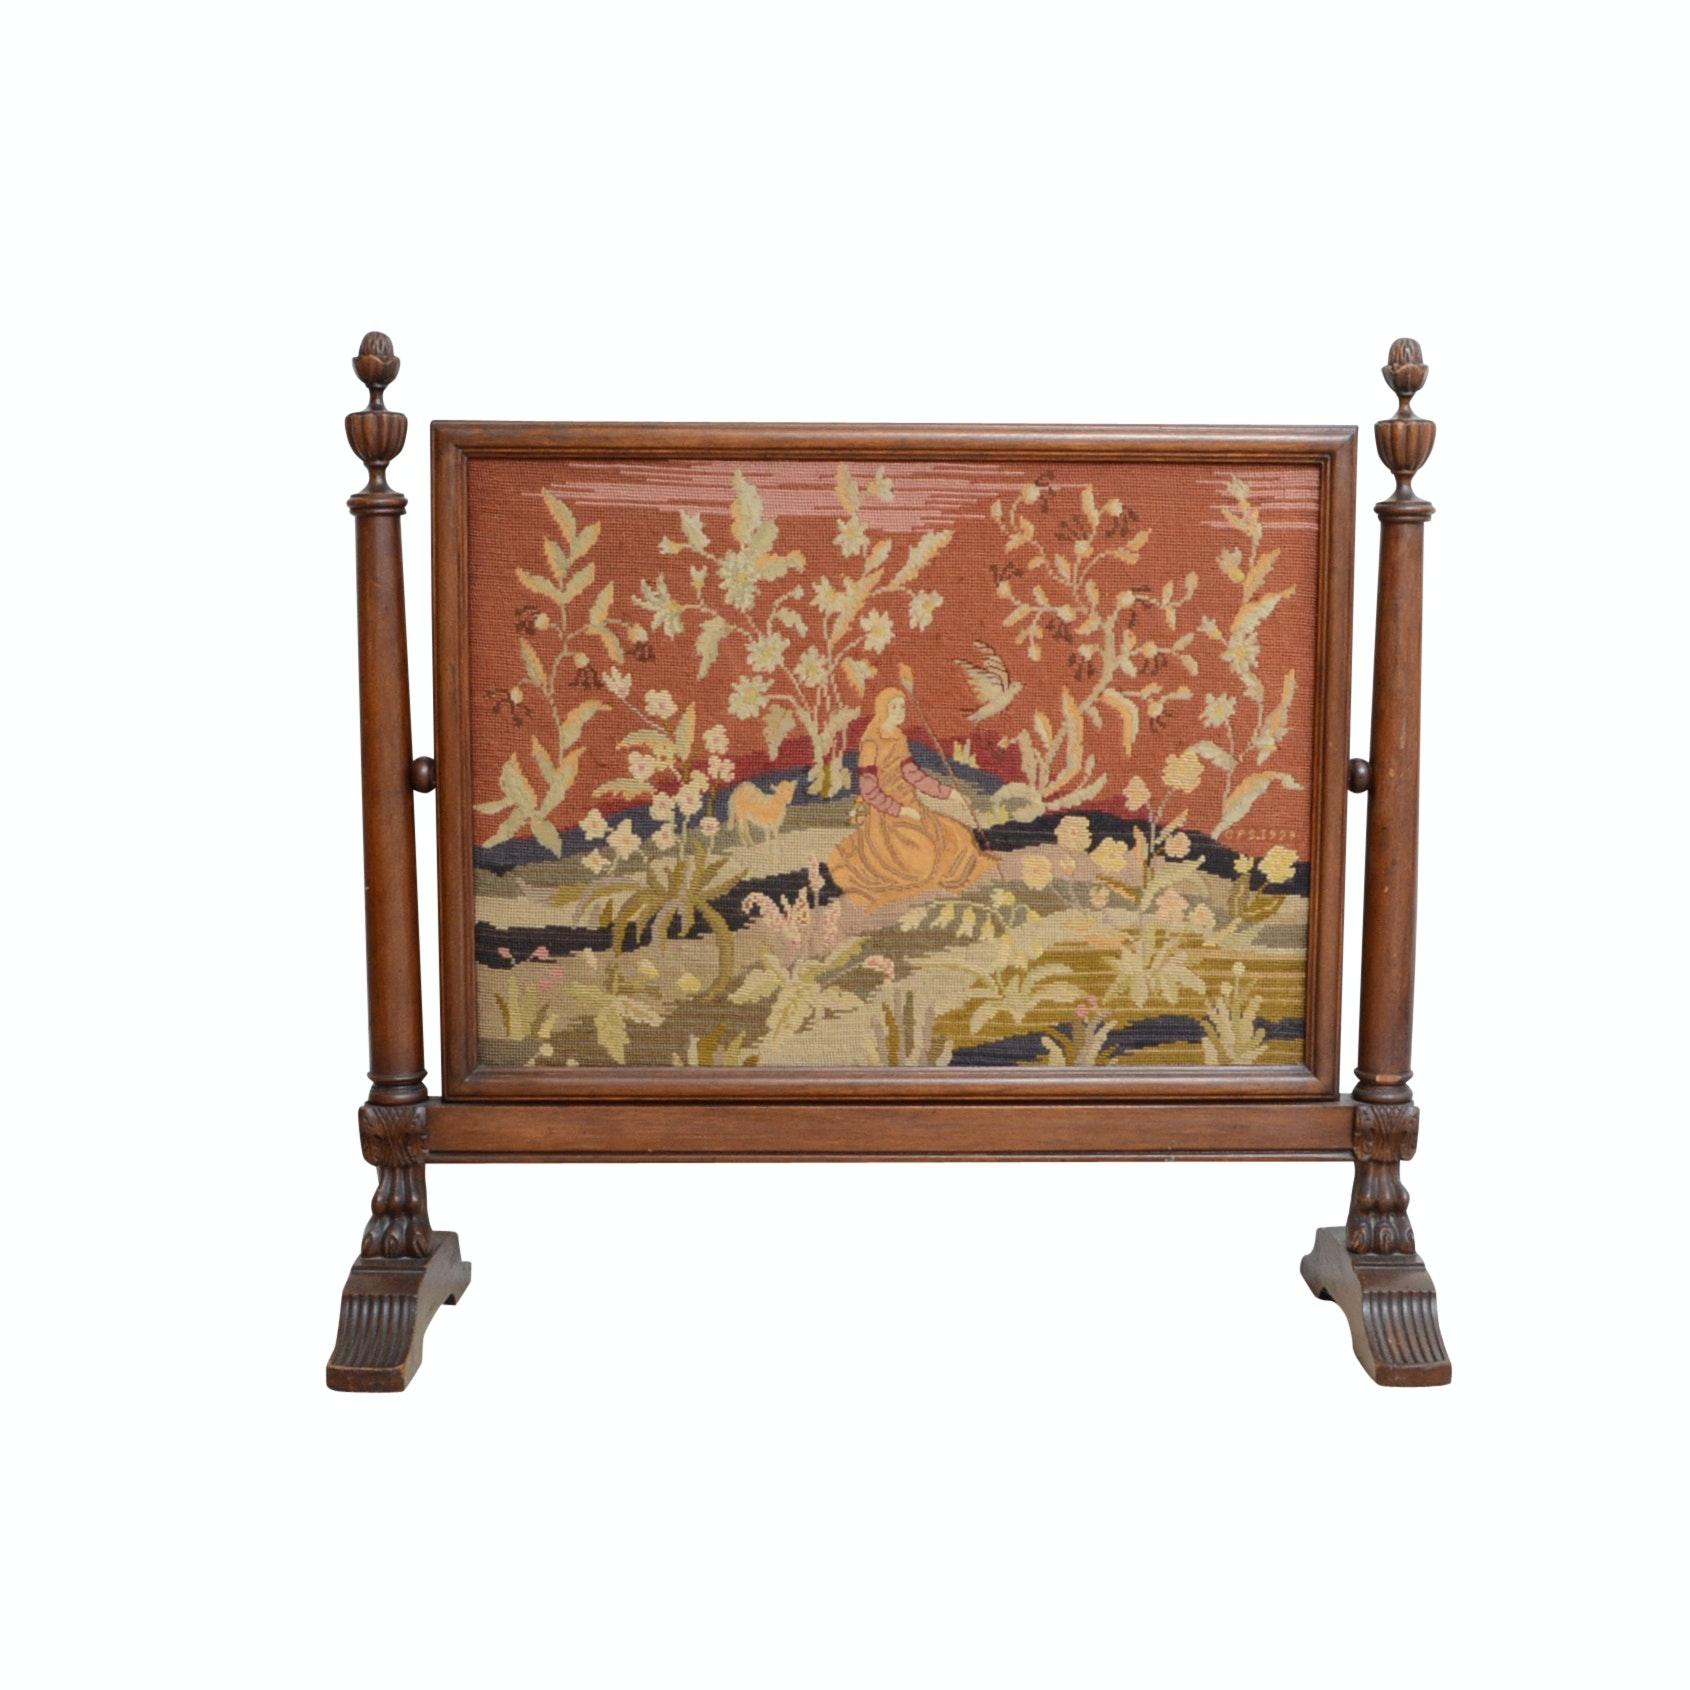 Antique Needlepoint Fireplace Screen